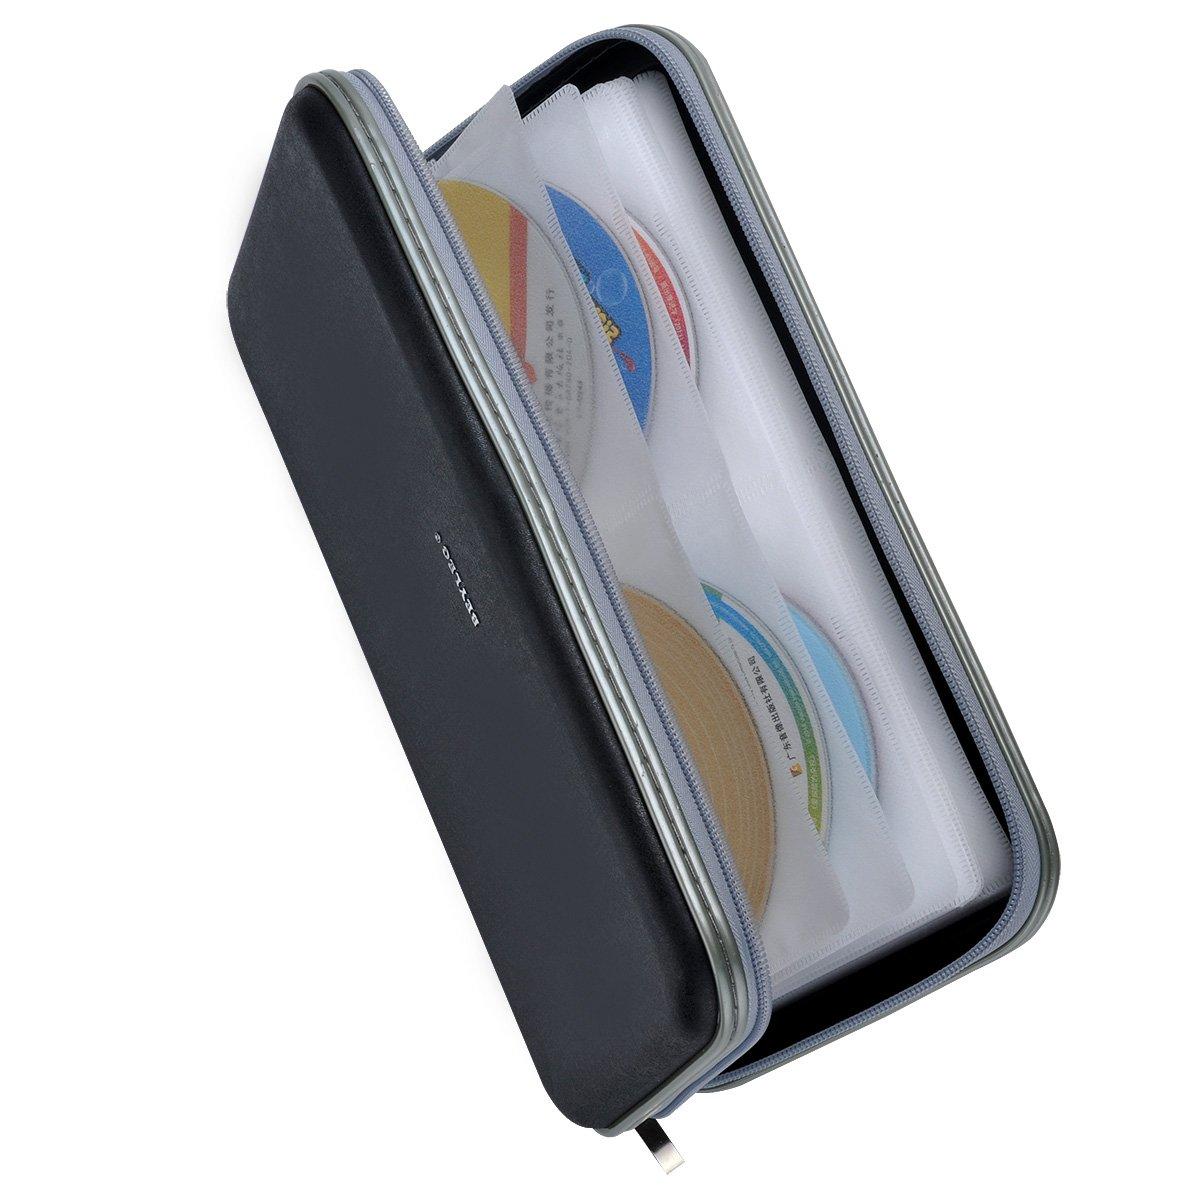 Wismart 72 Capacity Heavy Duty CD DVD Blu-ray Media Case Storage Holder Organizer Wallet (Black)